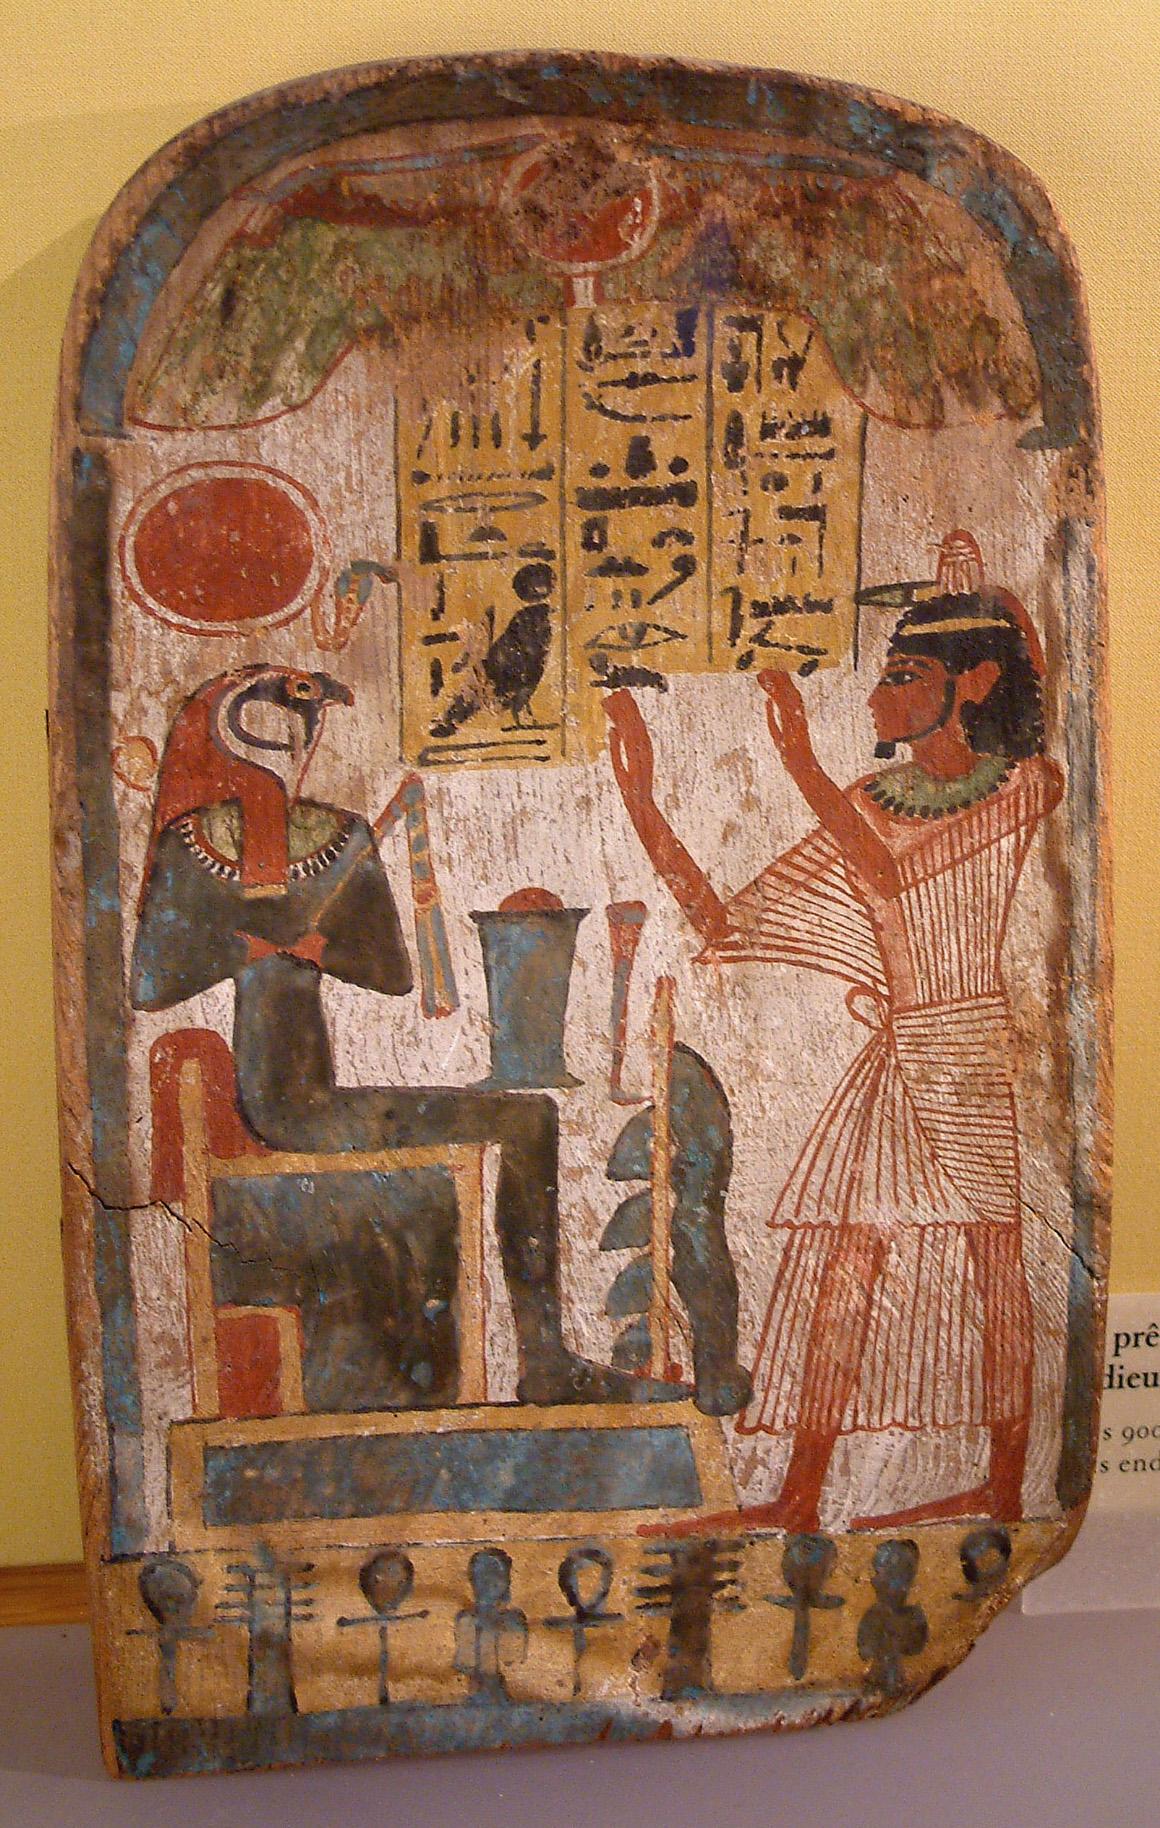 resourcesforhistoryteachers / Polytheistic Religion of